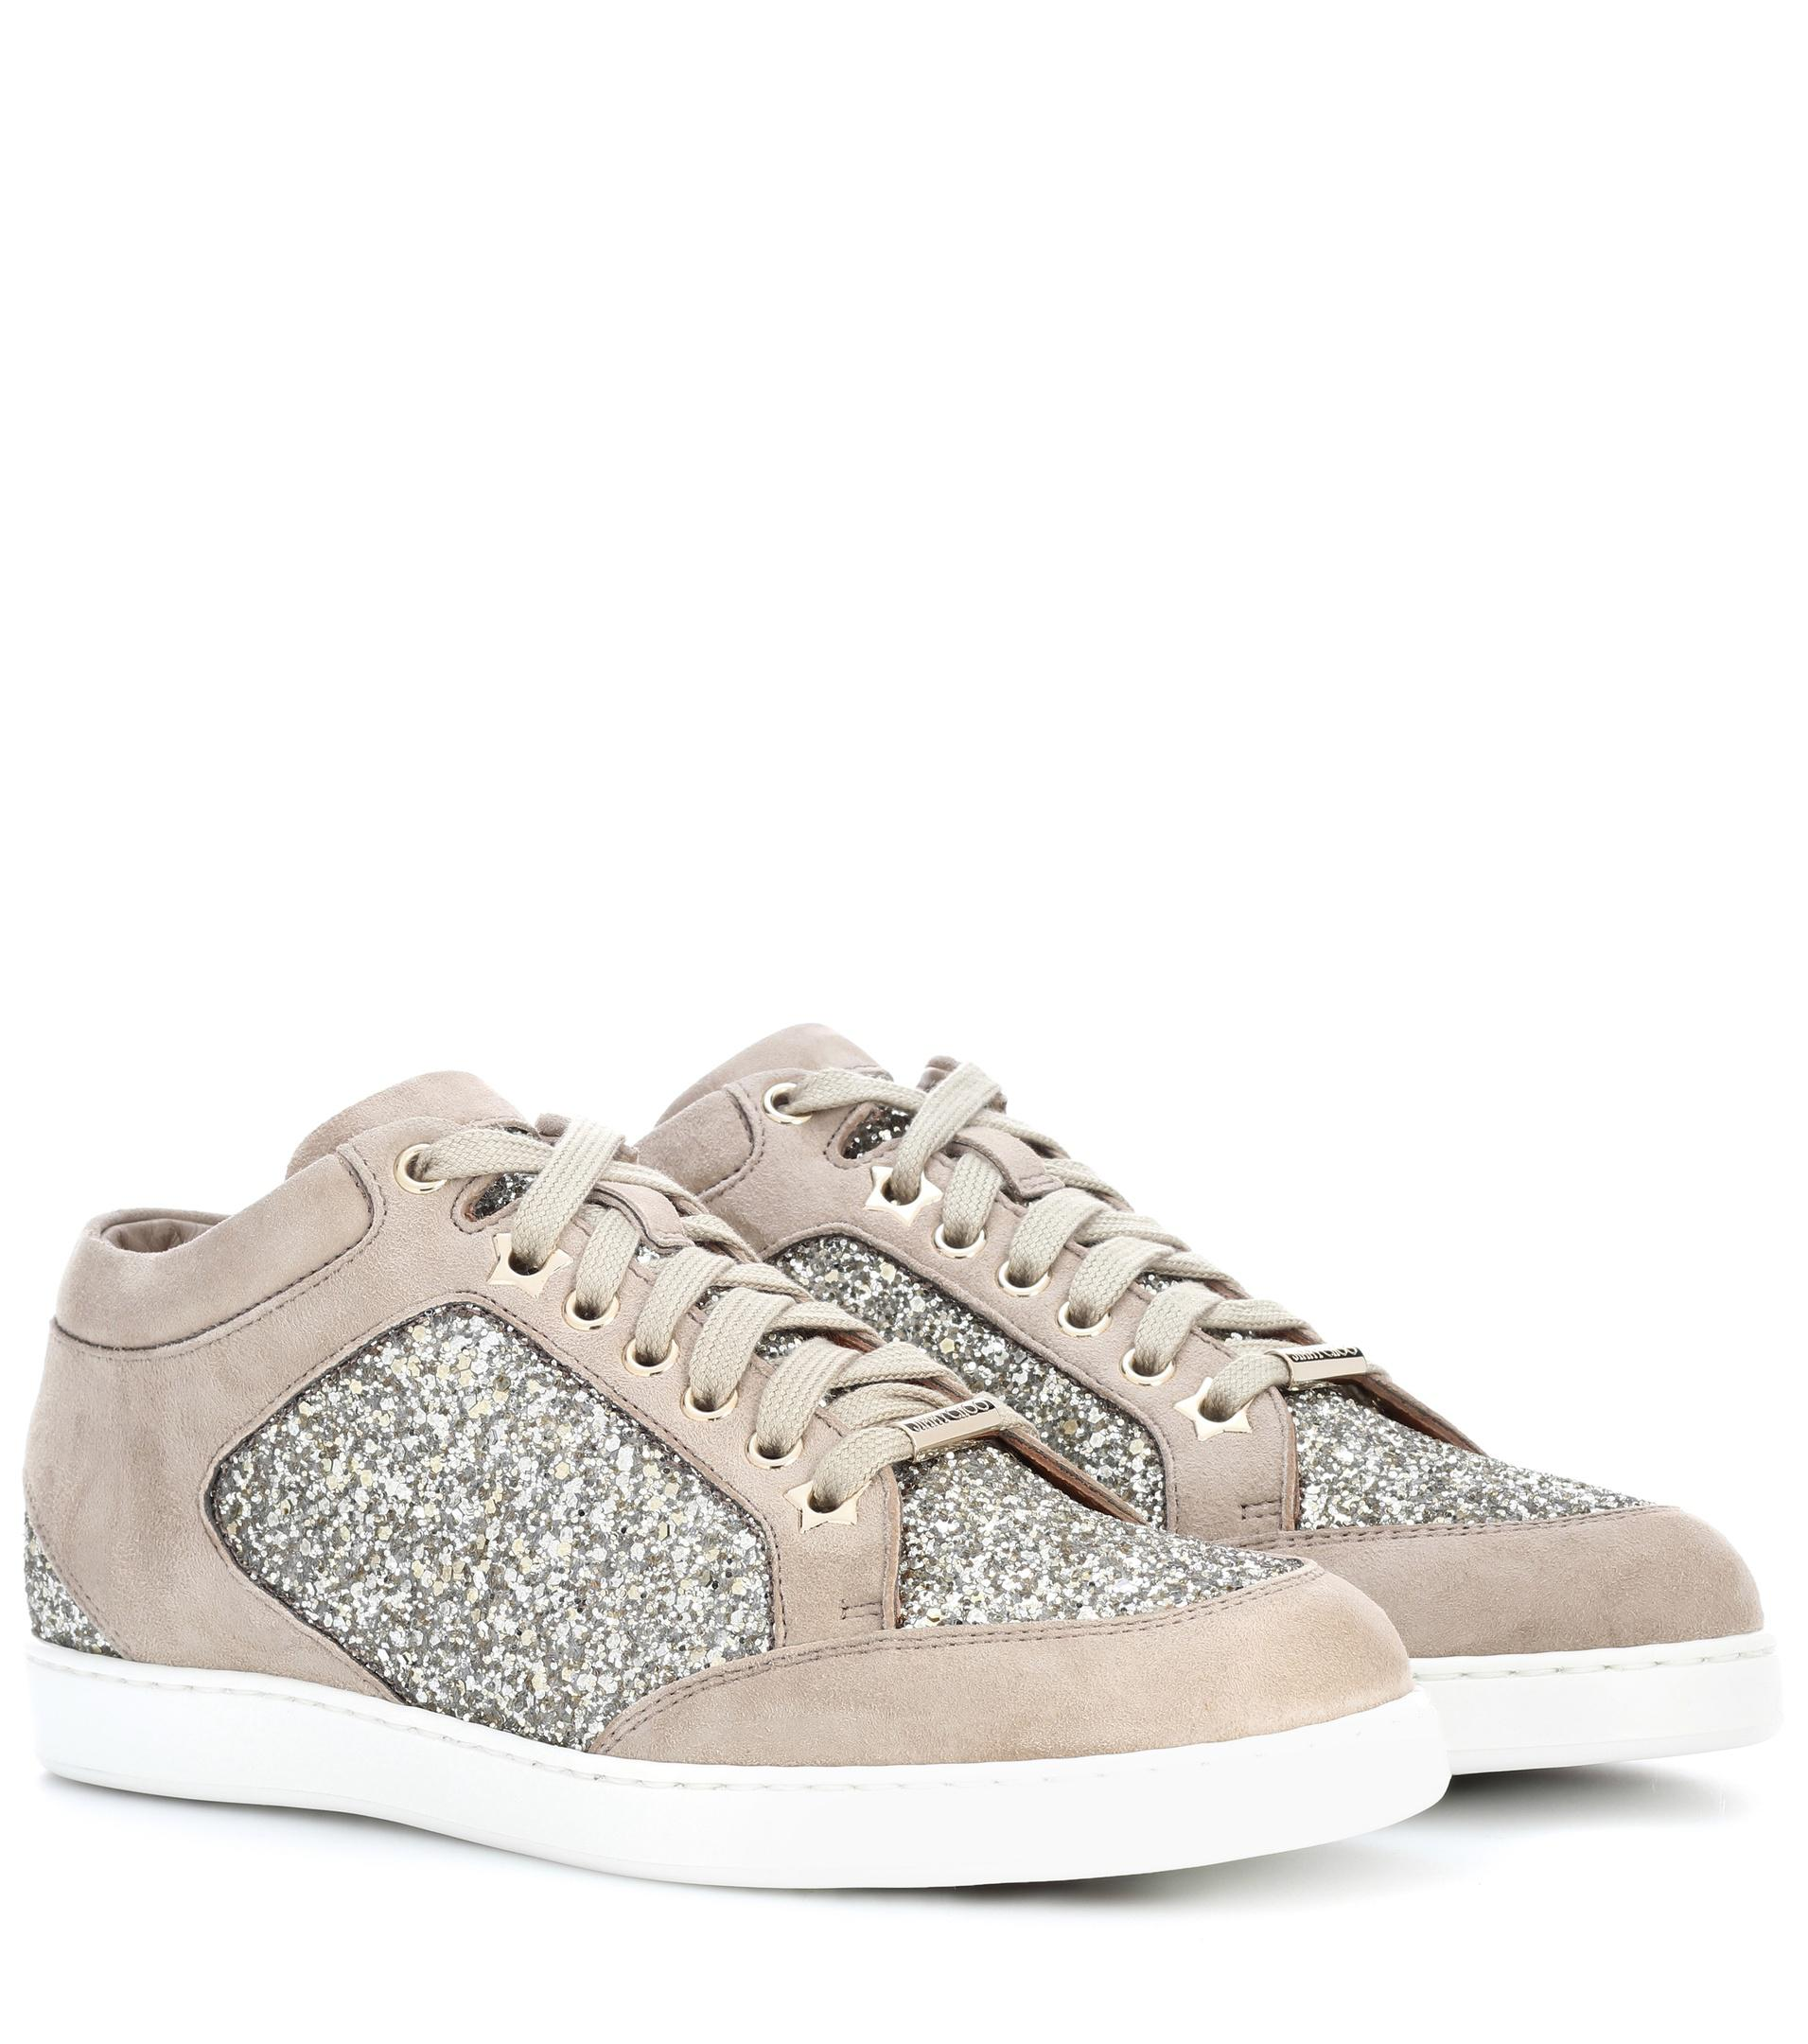 Jimmy choo Sneakers MIAMI calfskin glitter Glitter Logo feT9XRl65K